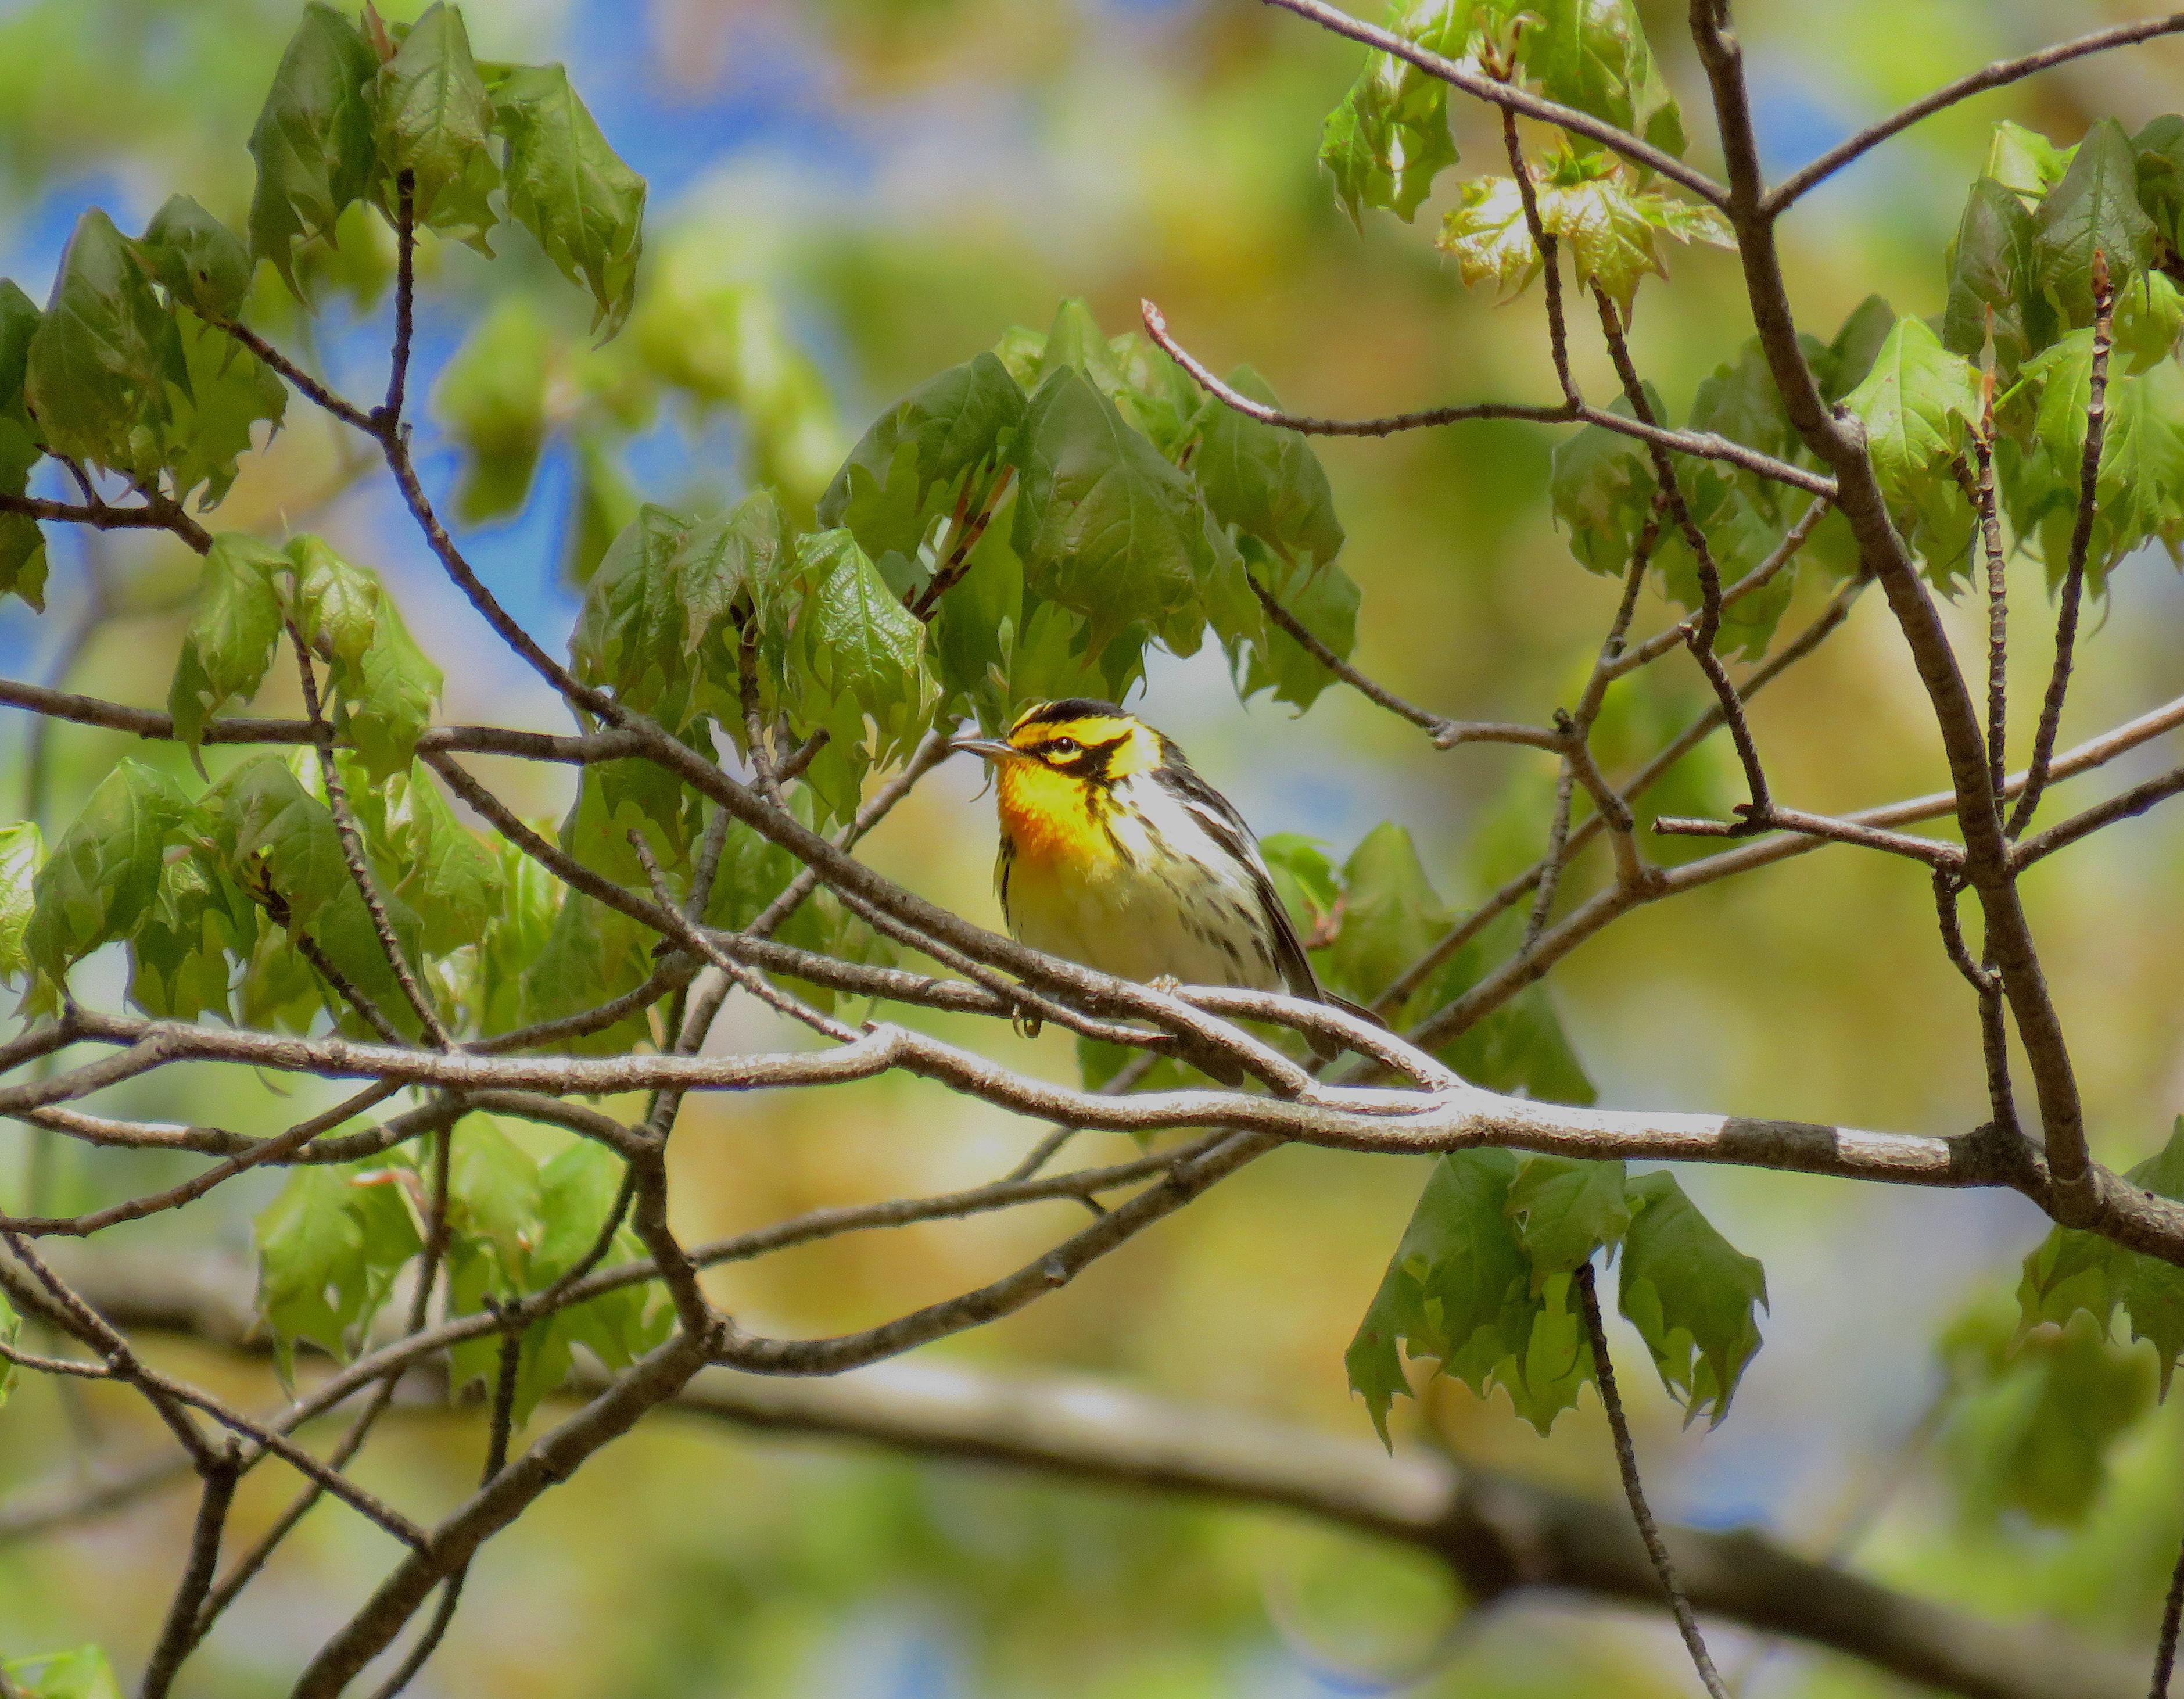 Blackburnian Warbler by Seth Inman - La Paz Group